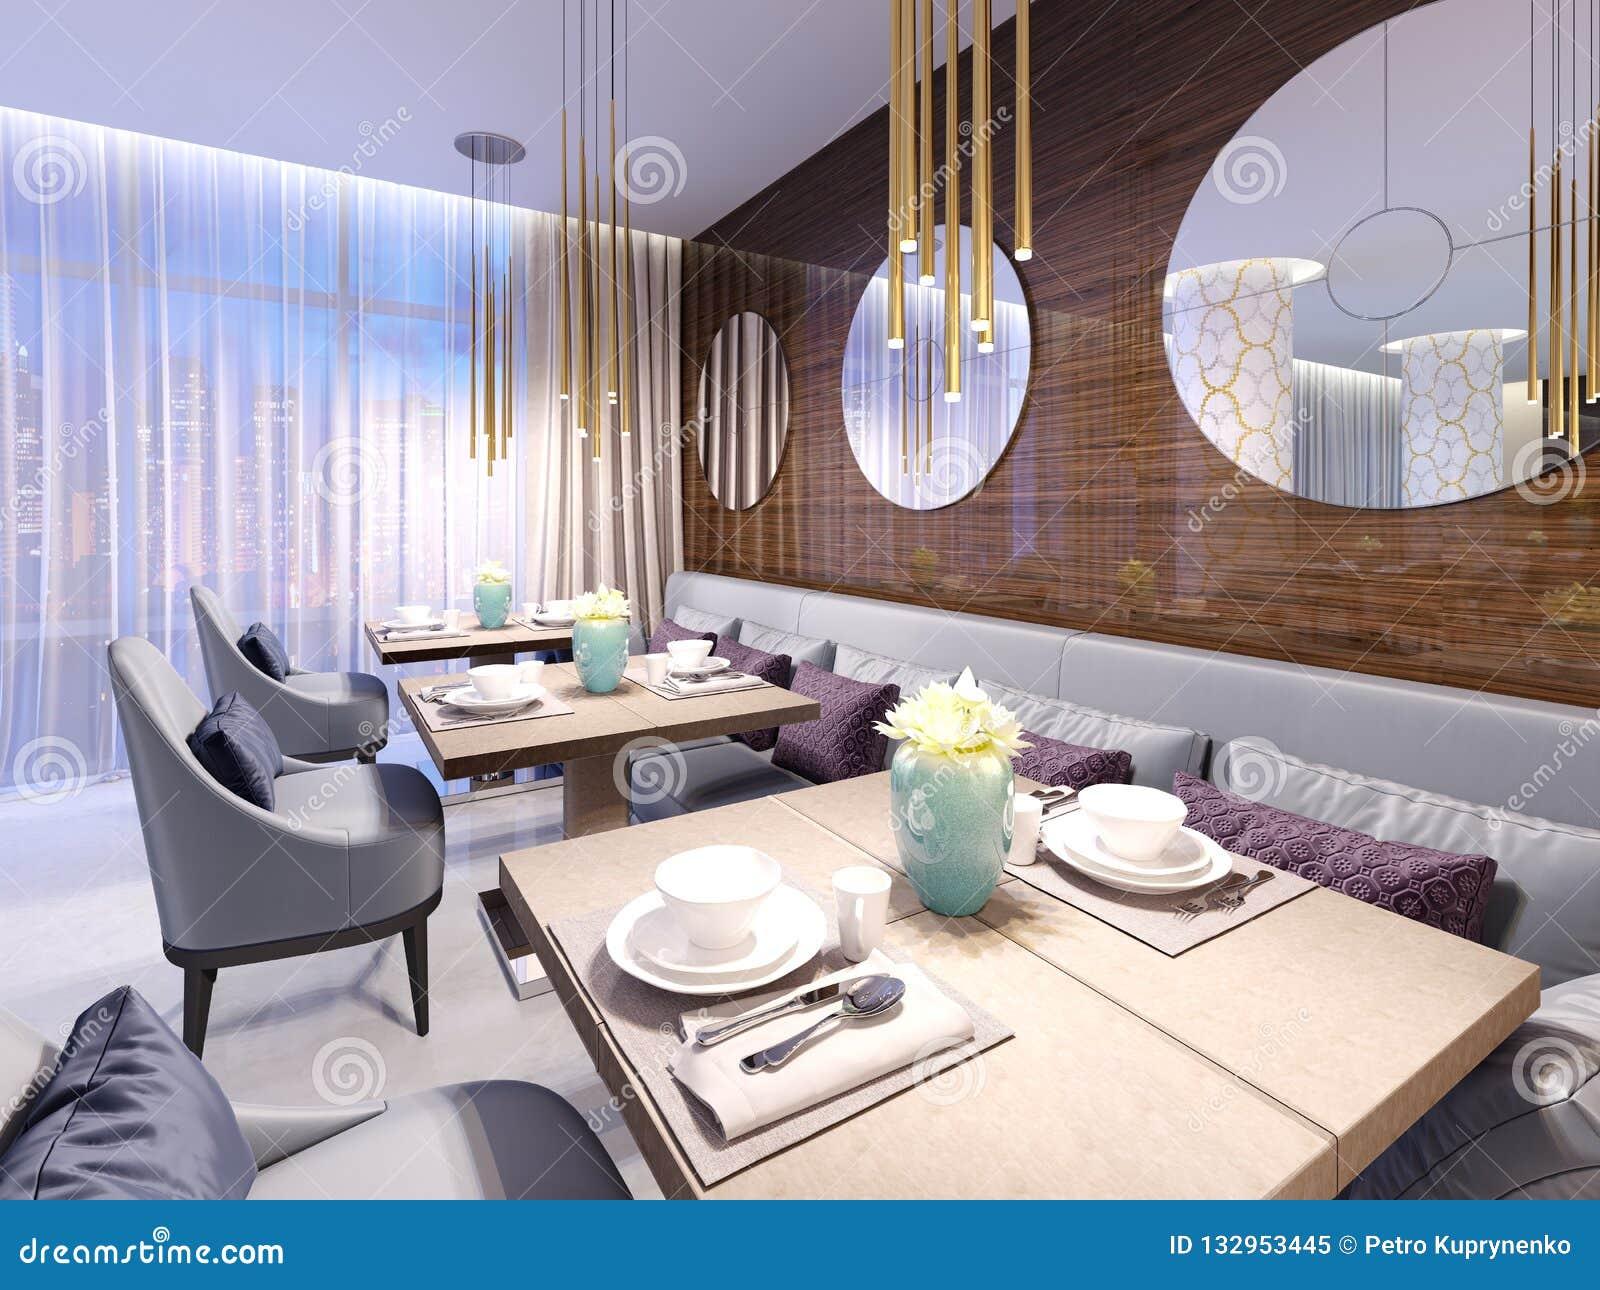 Terrific Modern Restaurant With Wooden Decorative Wall And Round Download Free Architecture Designs Lukepmadebymaigaardcom